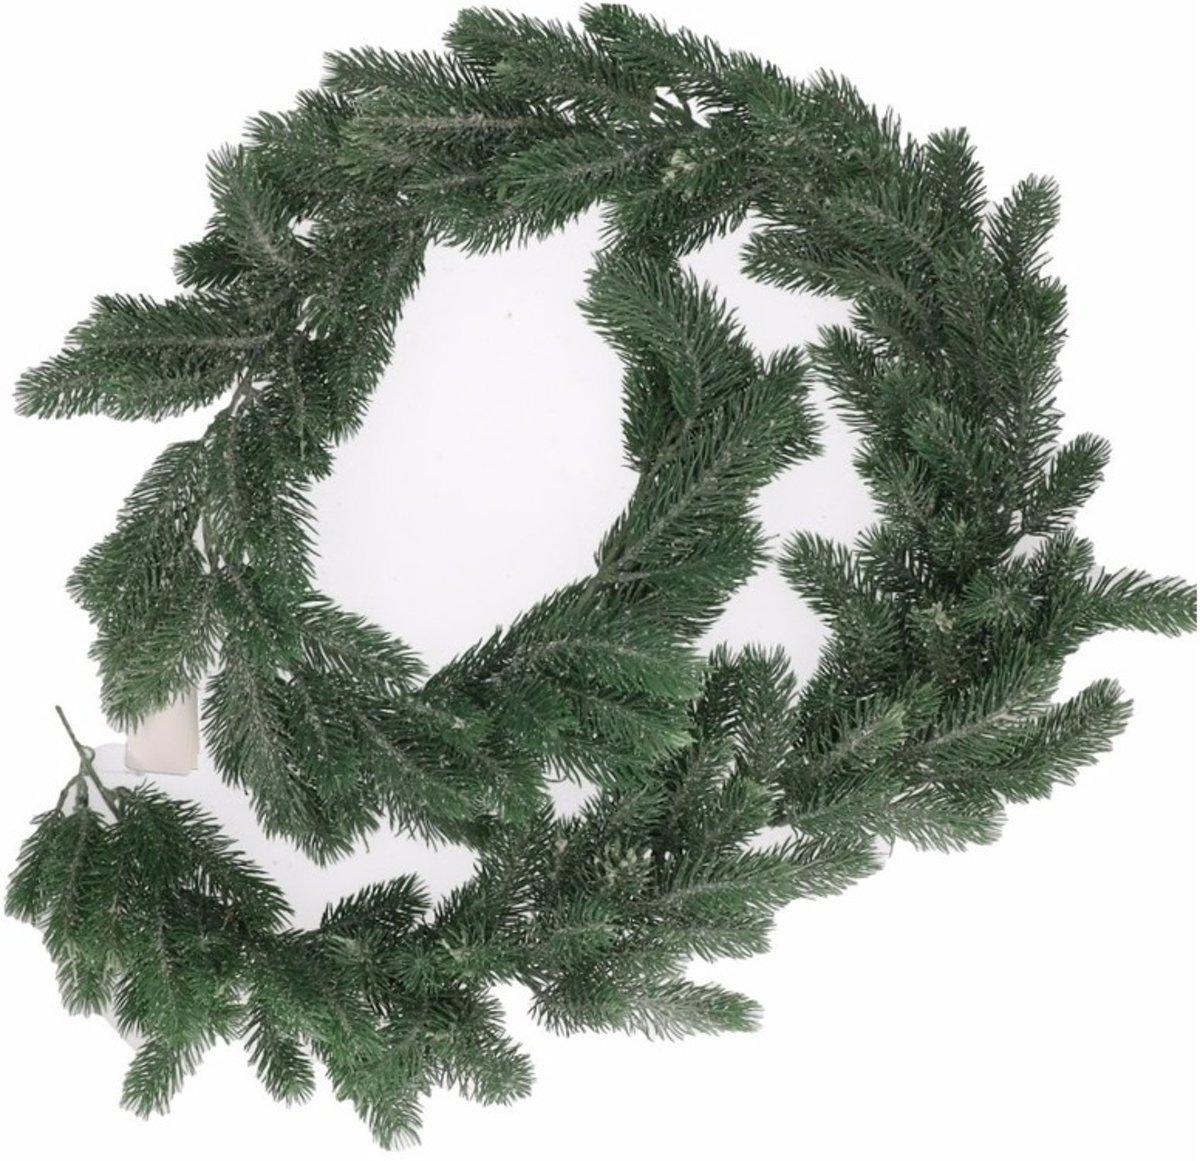 Groene dennentakken kerst slinger 180 cm kopen